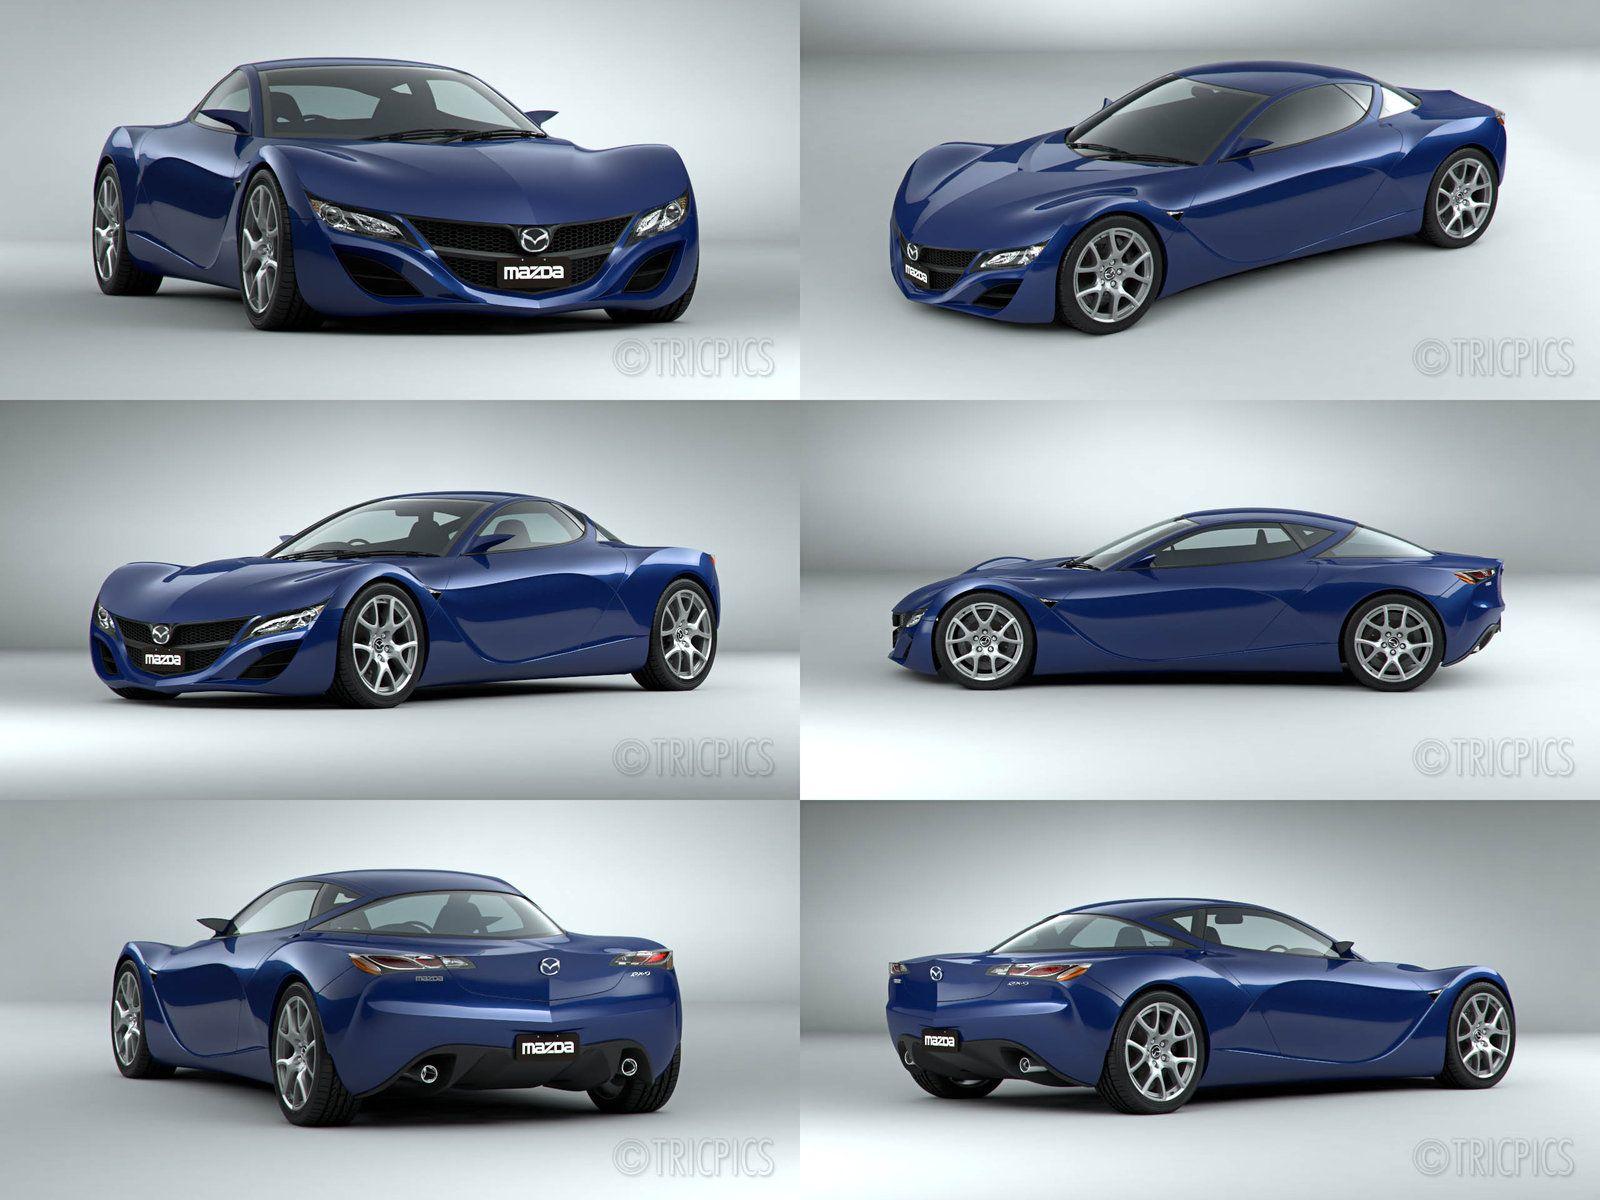 Mazda Concept [Thatu0027s One Sleek Little Number! I Like This